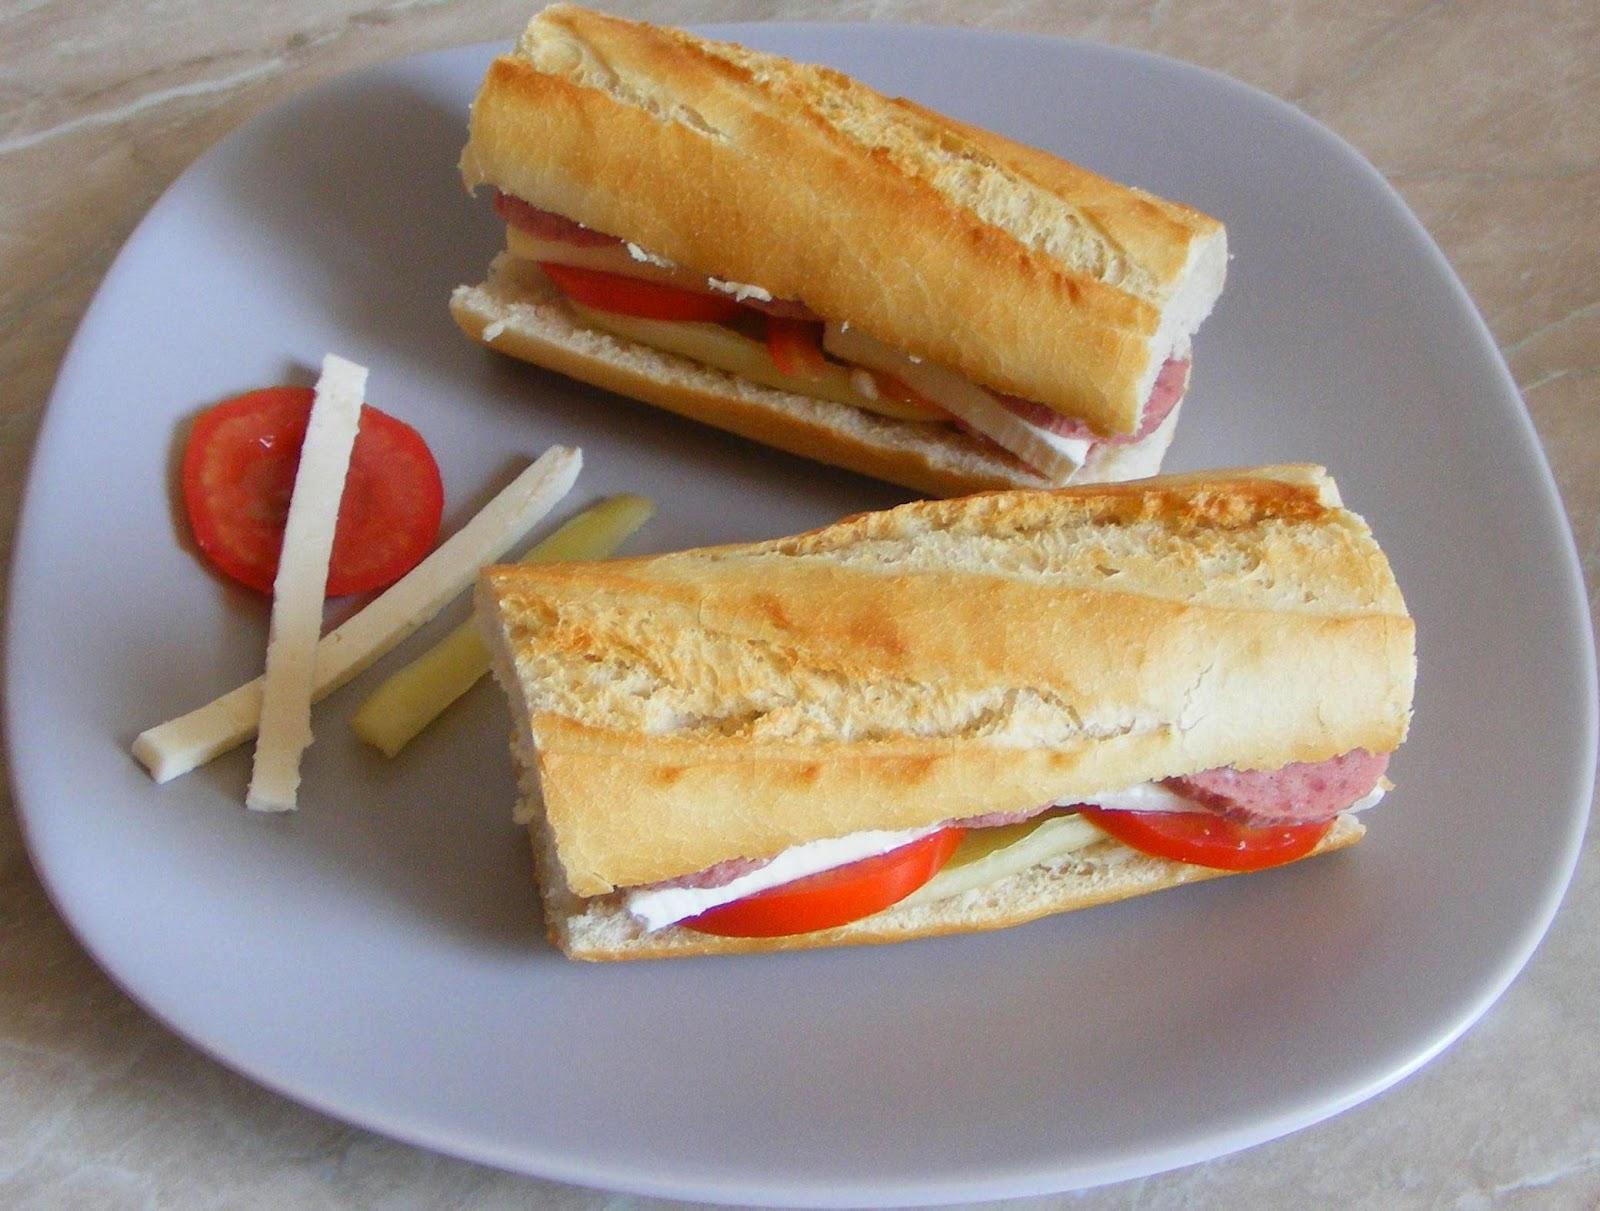 sandwich, sandwich din bagheta cu crenvursti, sandvis, sandvici, sendvici, sandwichuri, sandwich-uri, retete de mancare, retete mancare, gustari, gustare, retete rapide, retete usoare, sandwich retete, retete culinare, preparate culinare, retete mic dejun, reteta sanwich, reteta hot dog,